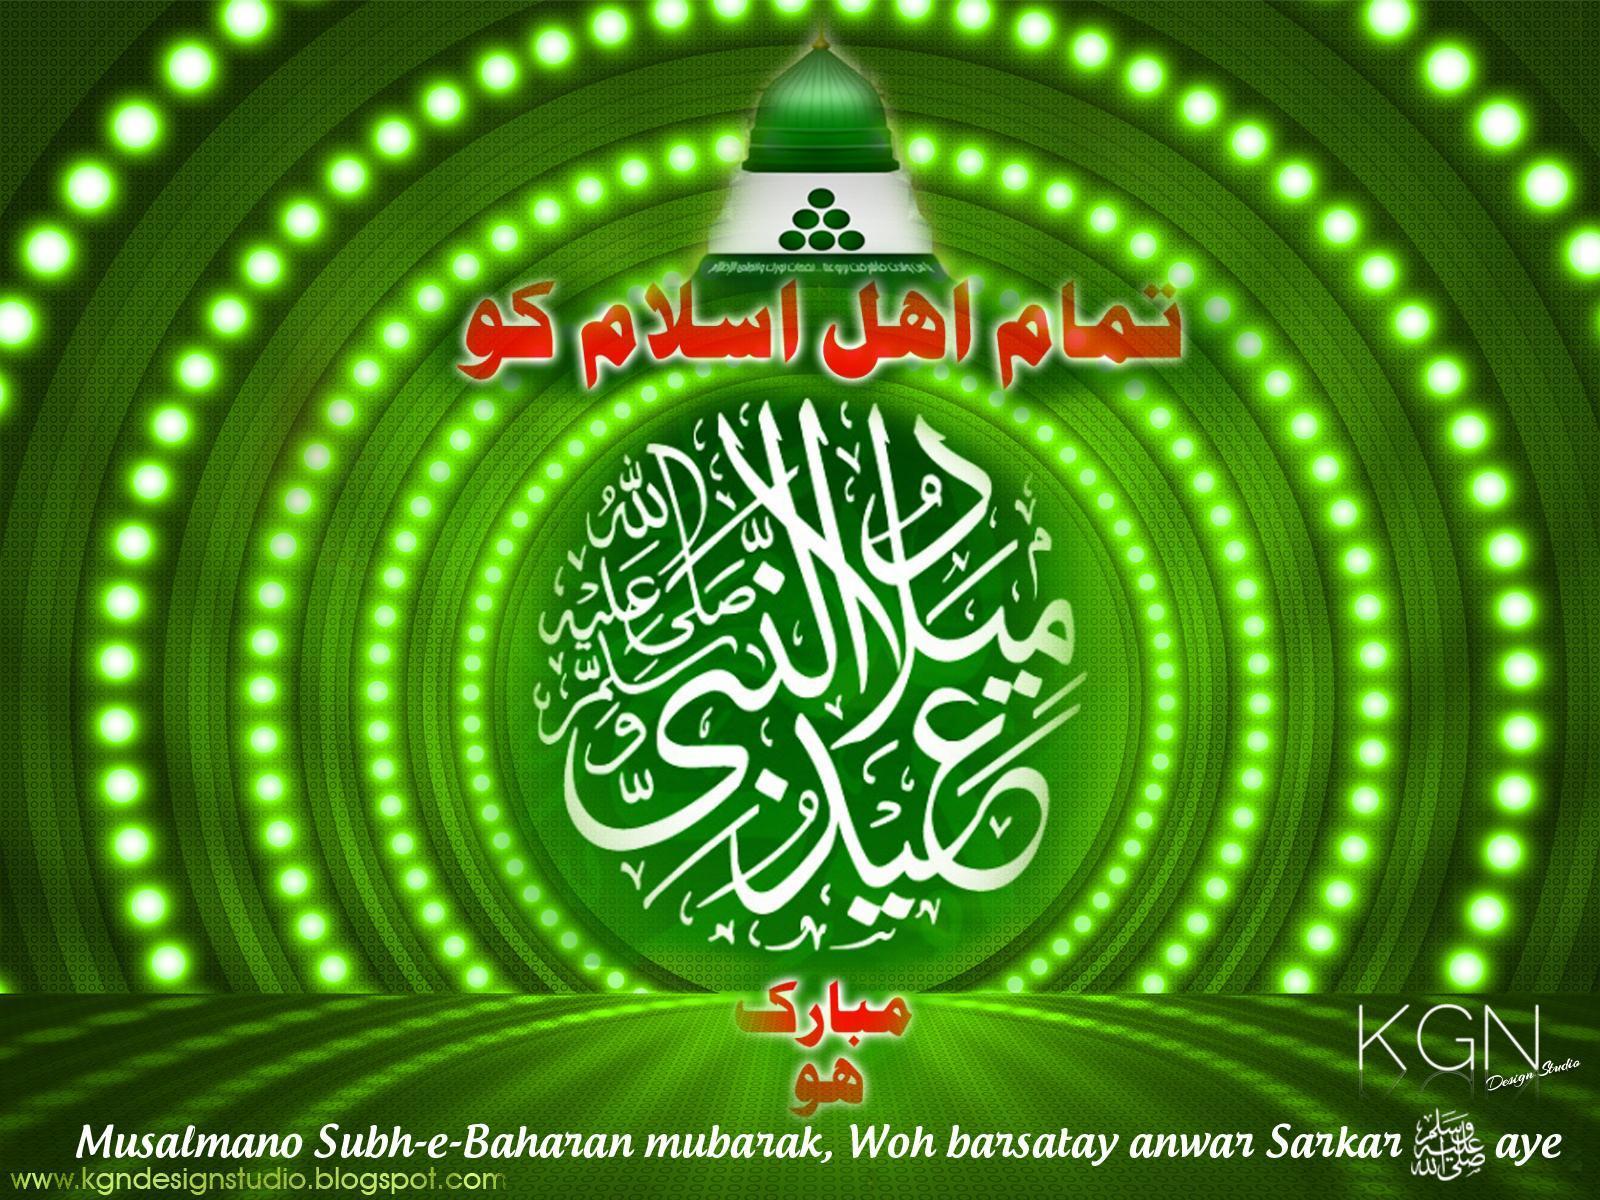 http://2.bp.blogspot.com/-qNFMHkfMKzo/UOa2qztvIPI/AAAAAAAACPM/ofj143vkegg/s1600/Eid-e-Milad-Wallpaper-11.JPG